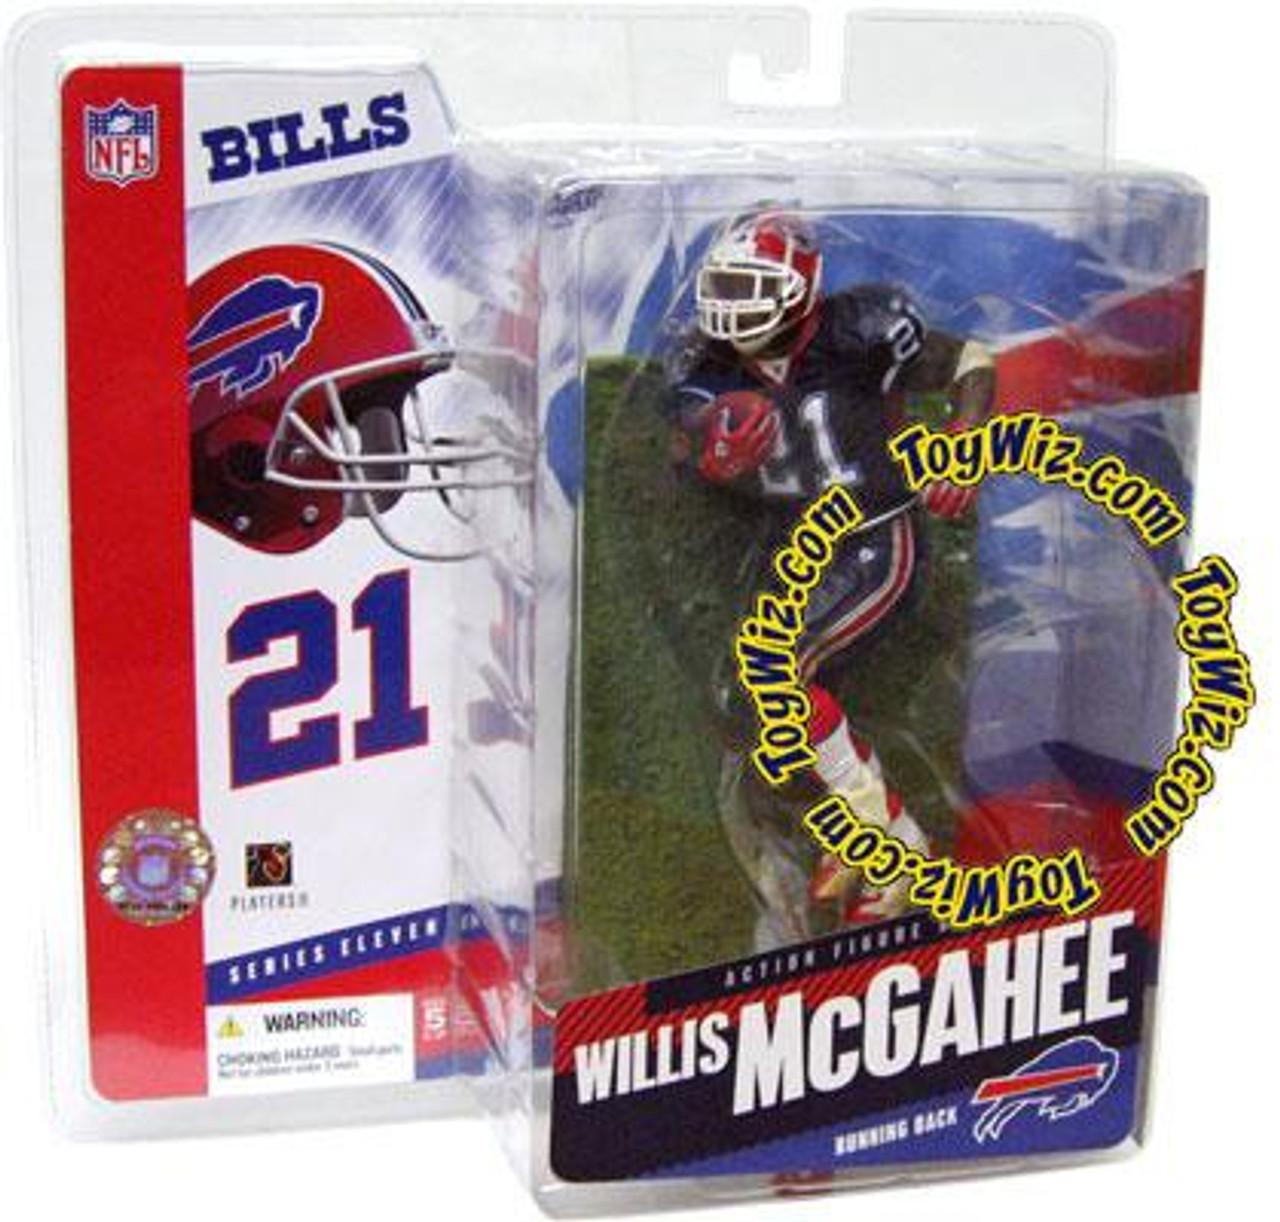 McFarlane Toys NFL Buffalo Bills Sports Picks Series 11 Willis McGahee Action Figure [Blue Jersey]